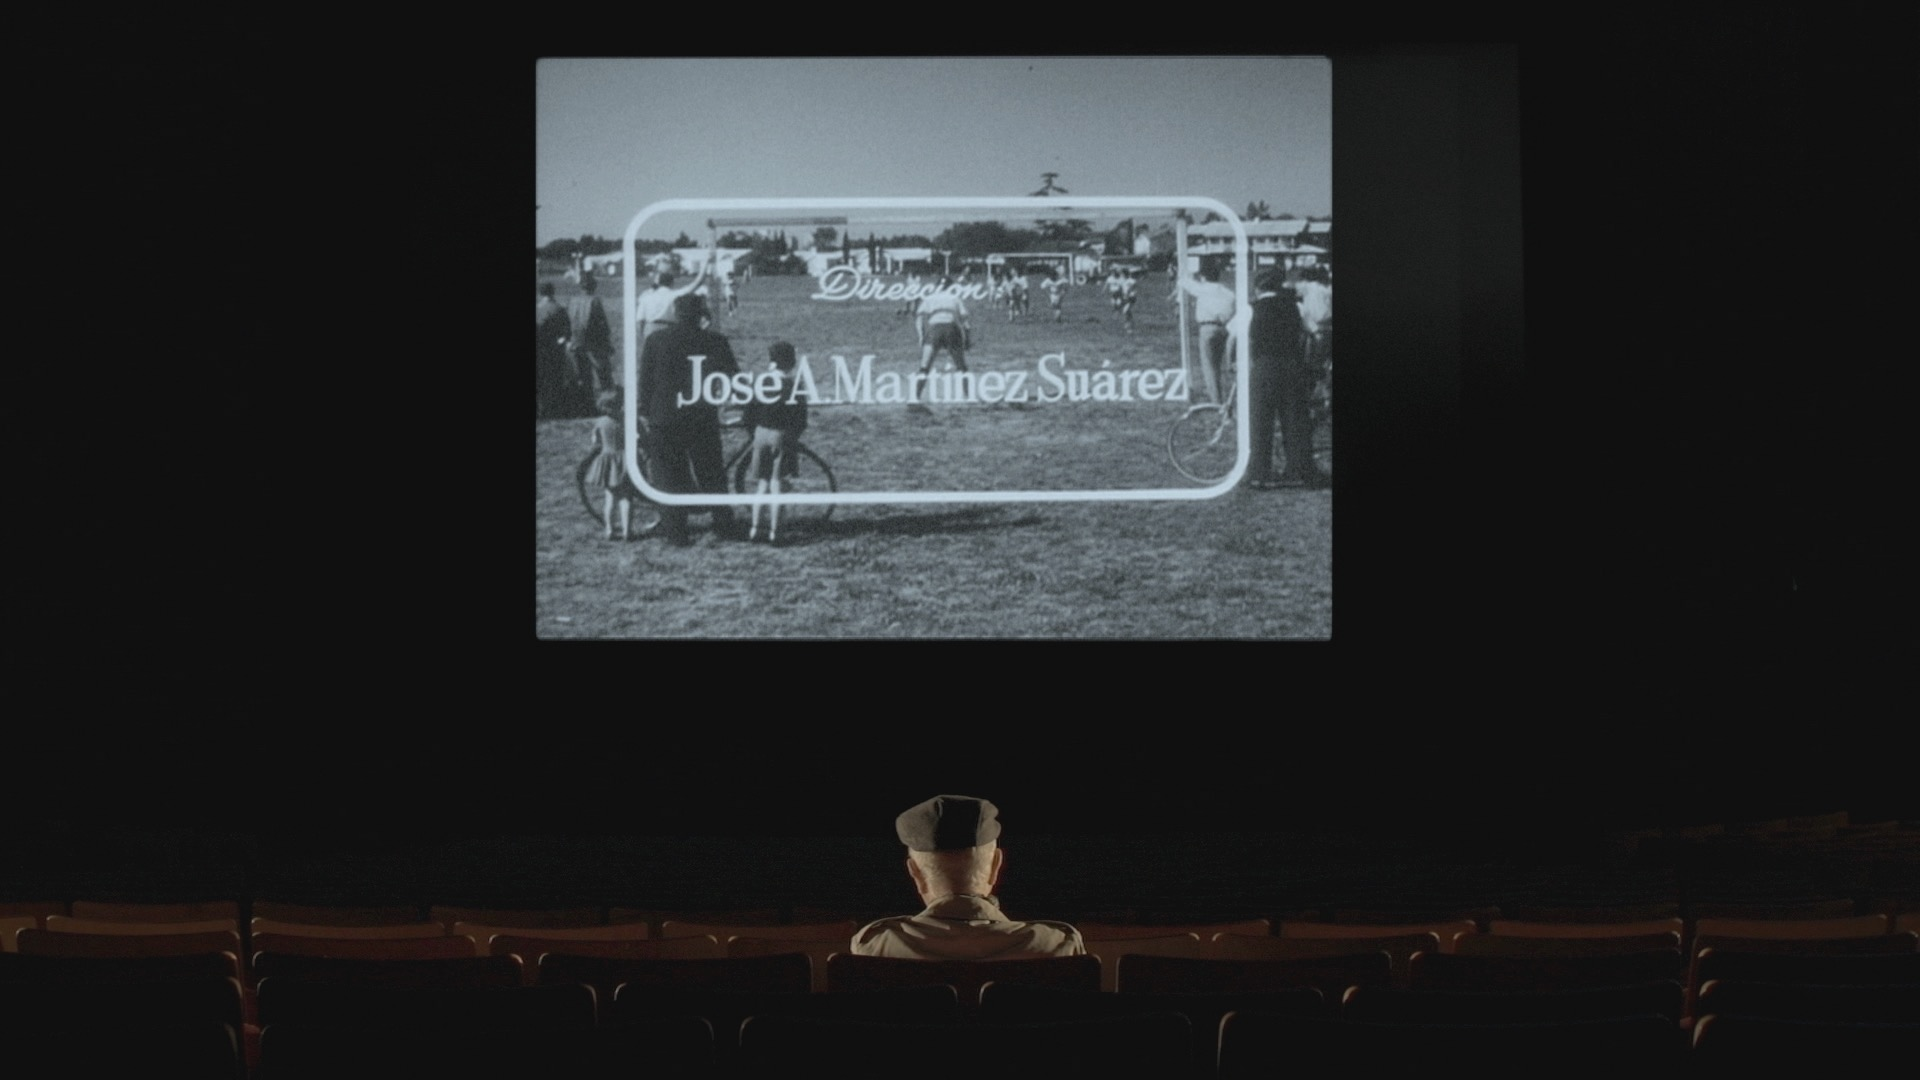 poster, soy lo que quise ser, I am what I wanted to be, jose martinez suarez, filmmaker, film about films, shortsfit, pensilvania films, shortsfit distribucion, world sales agent, film distribution